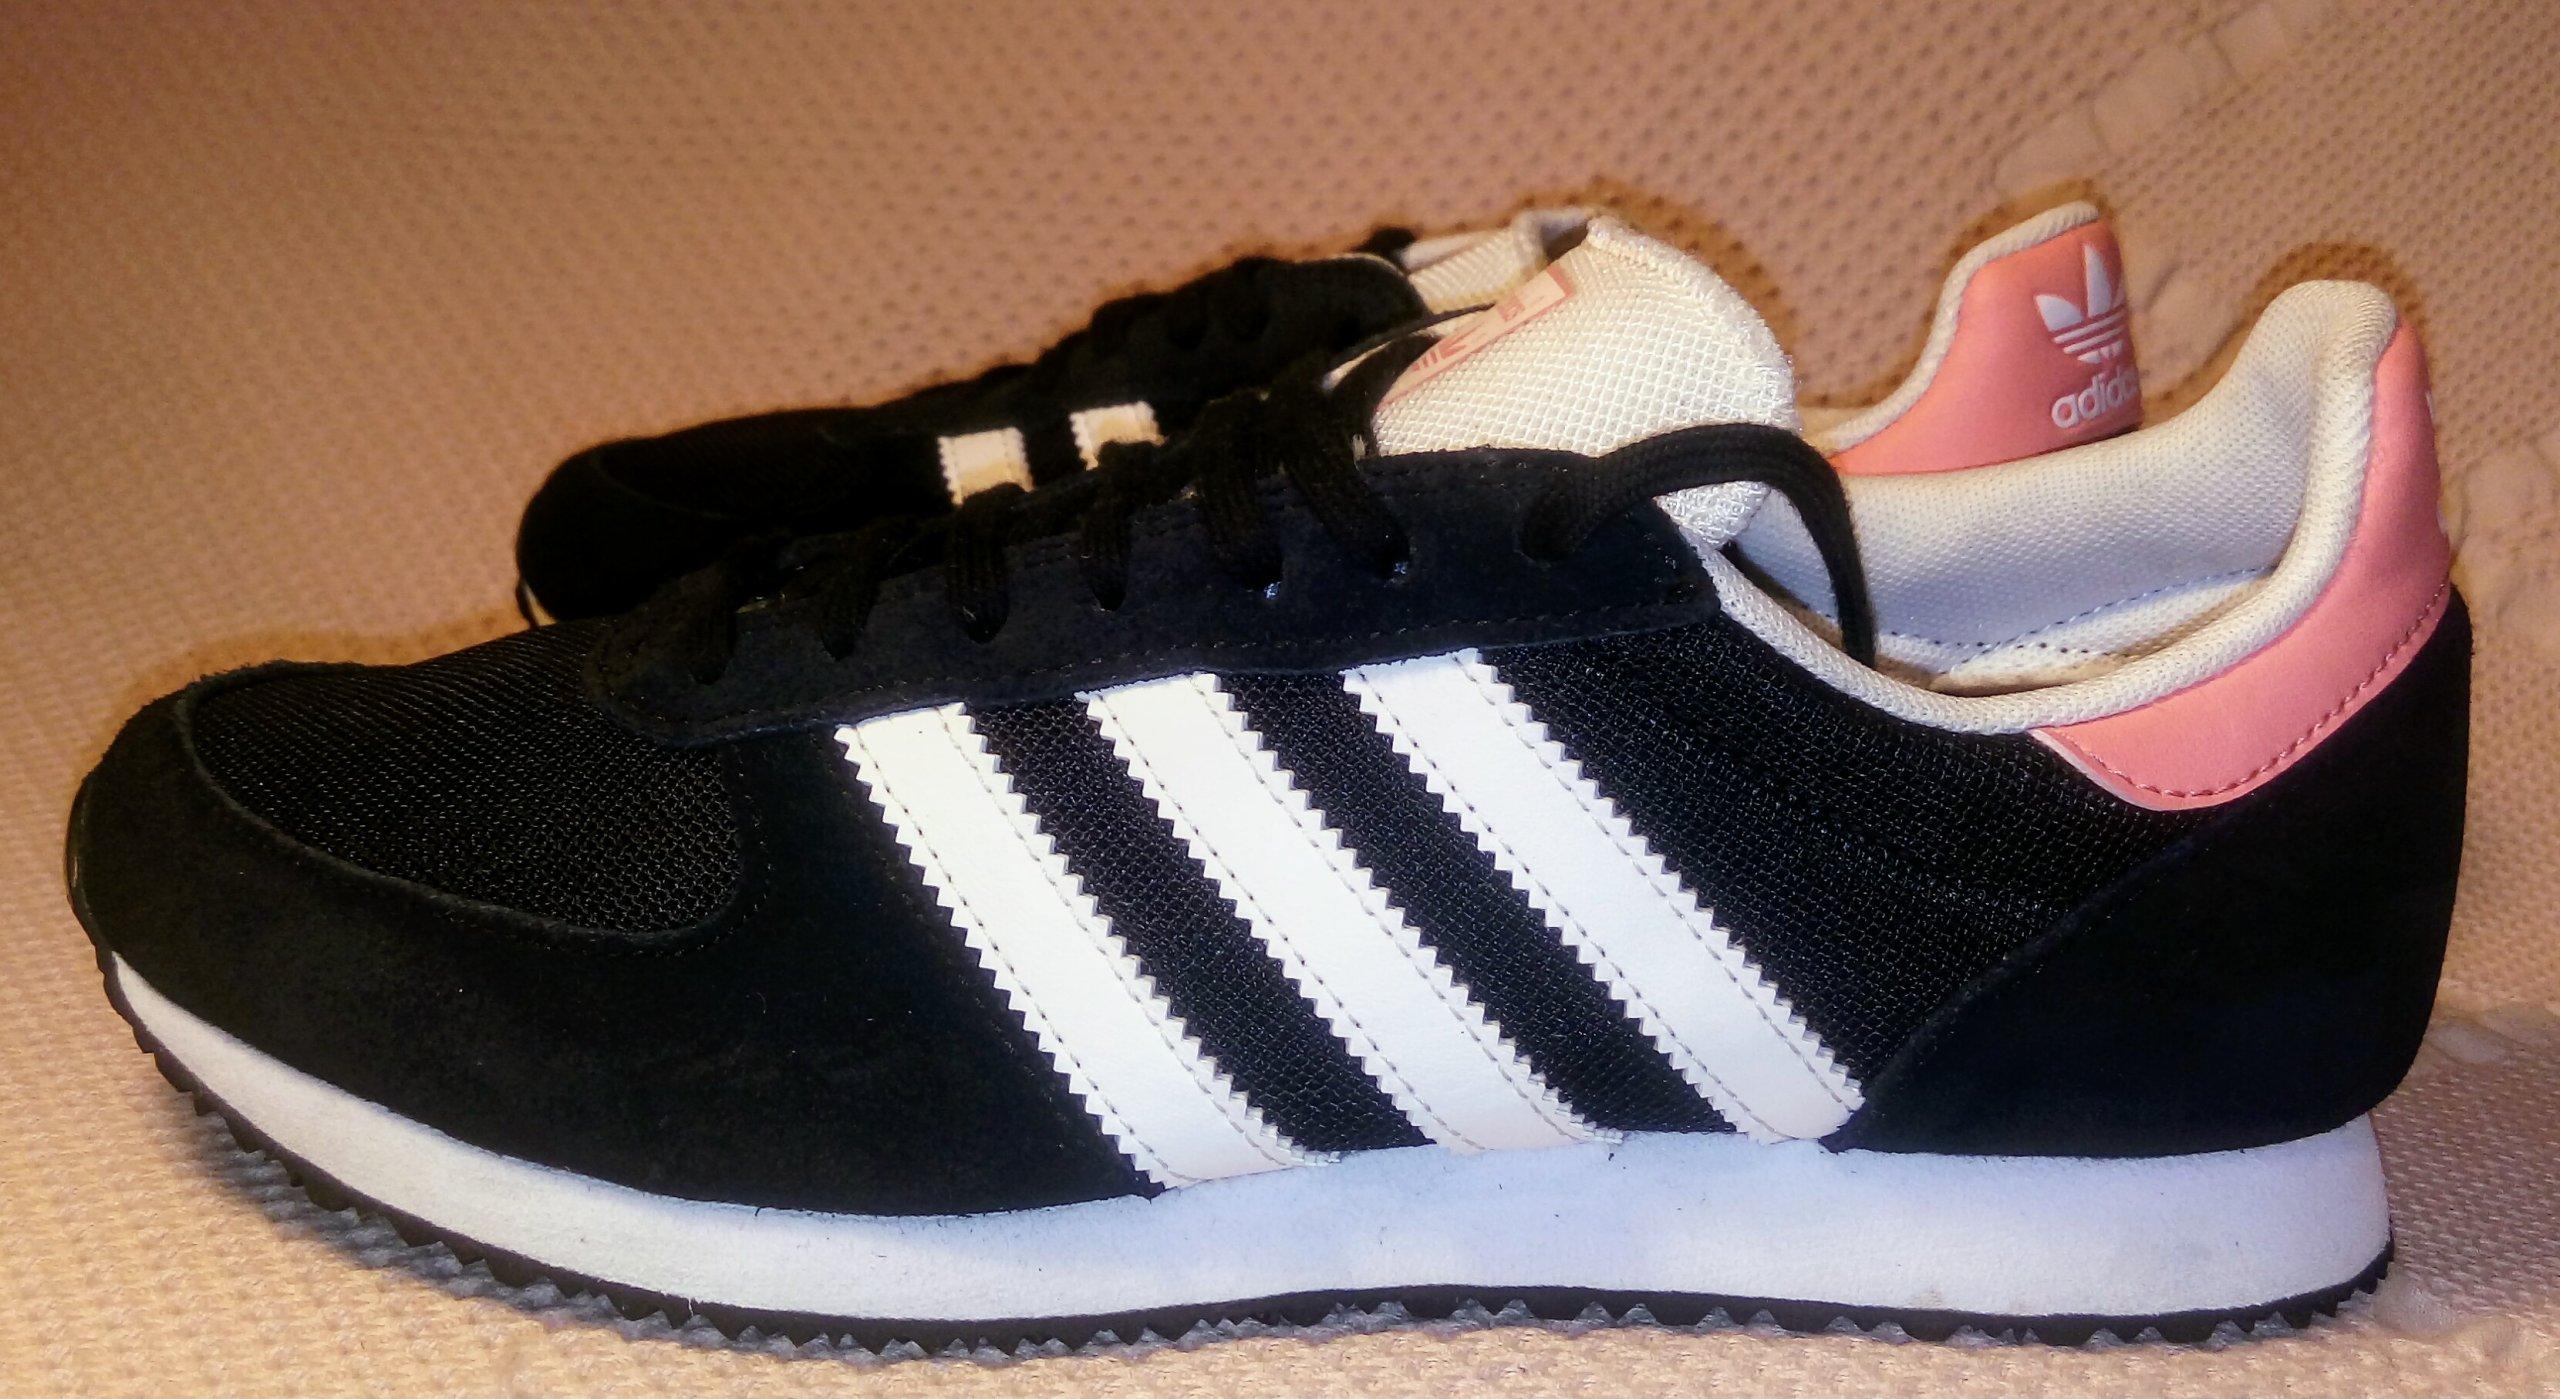 super cute 3434c ce00c Nowe damske adidas zx racer ( original) - 7349422462 ...